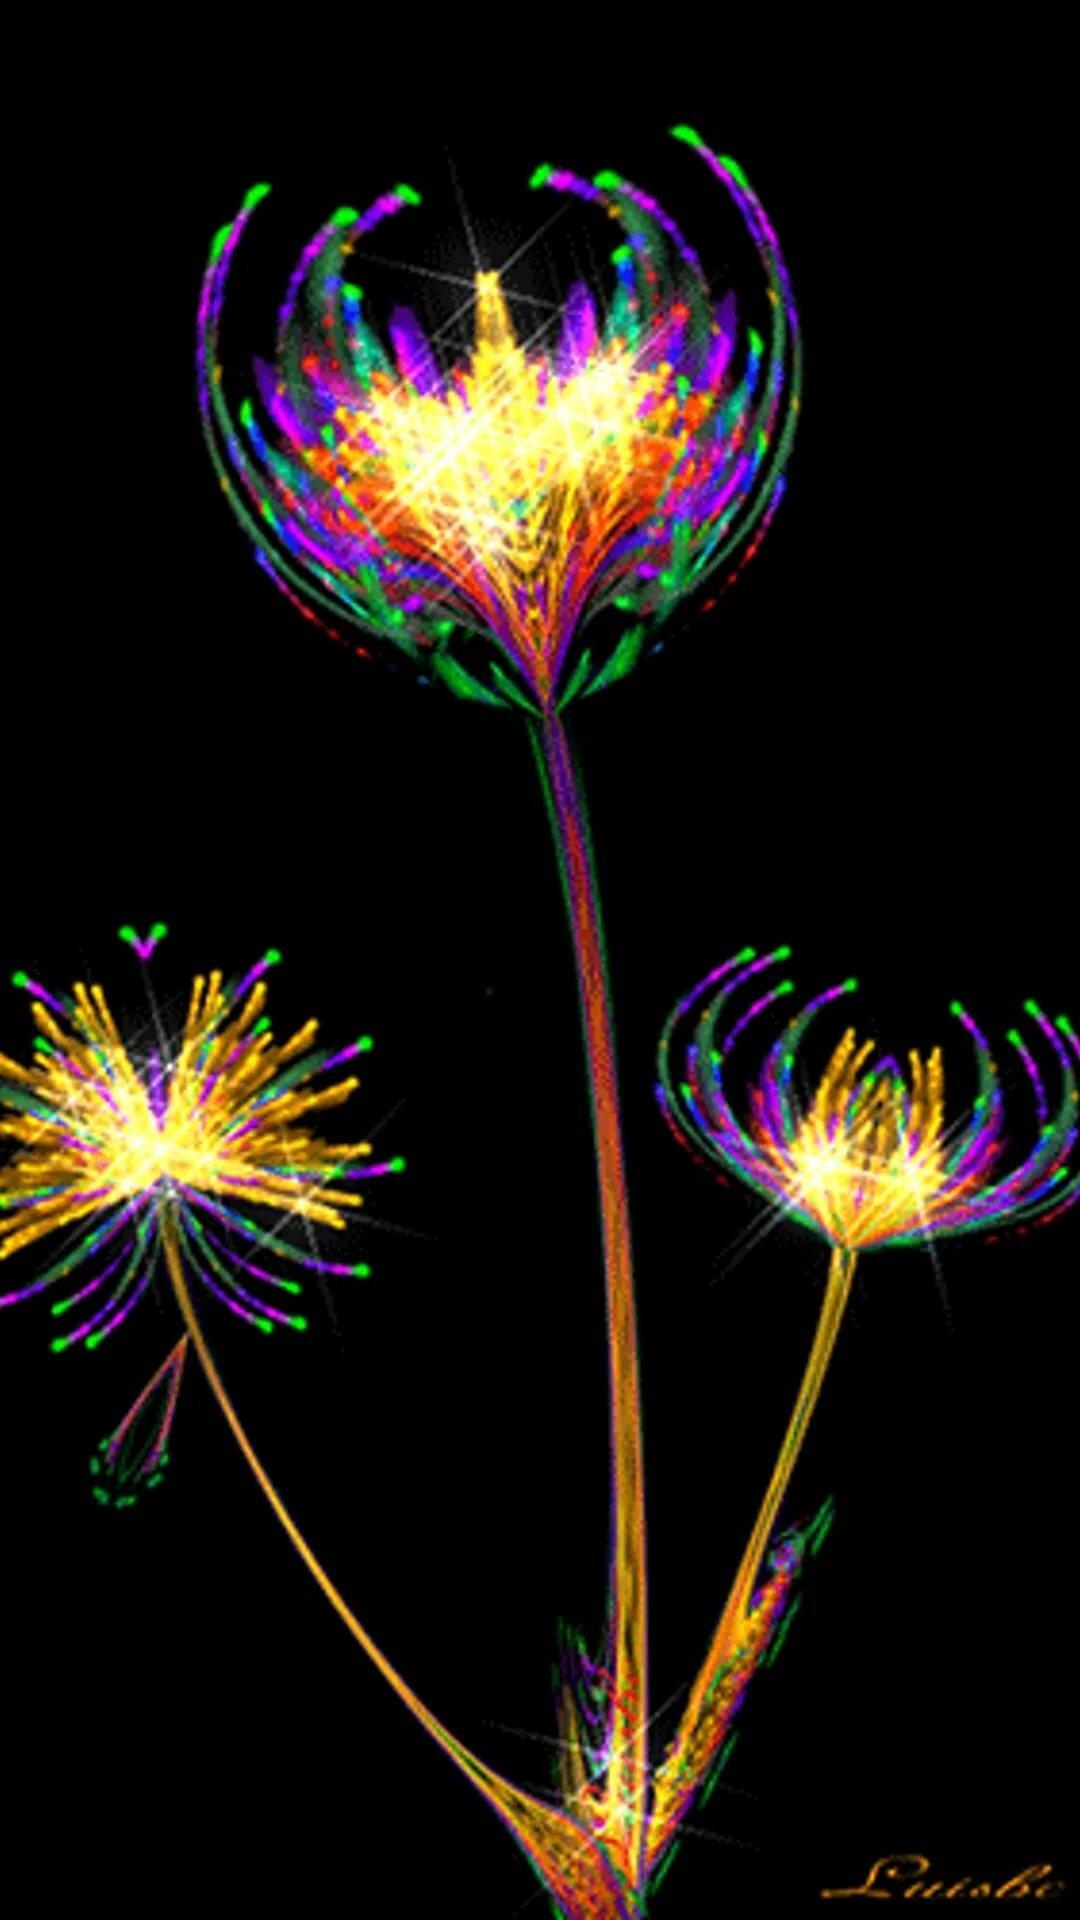 Фотографии цветка ириса была нужна